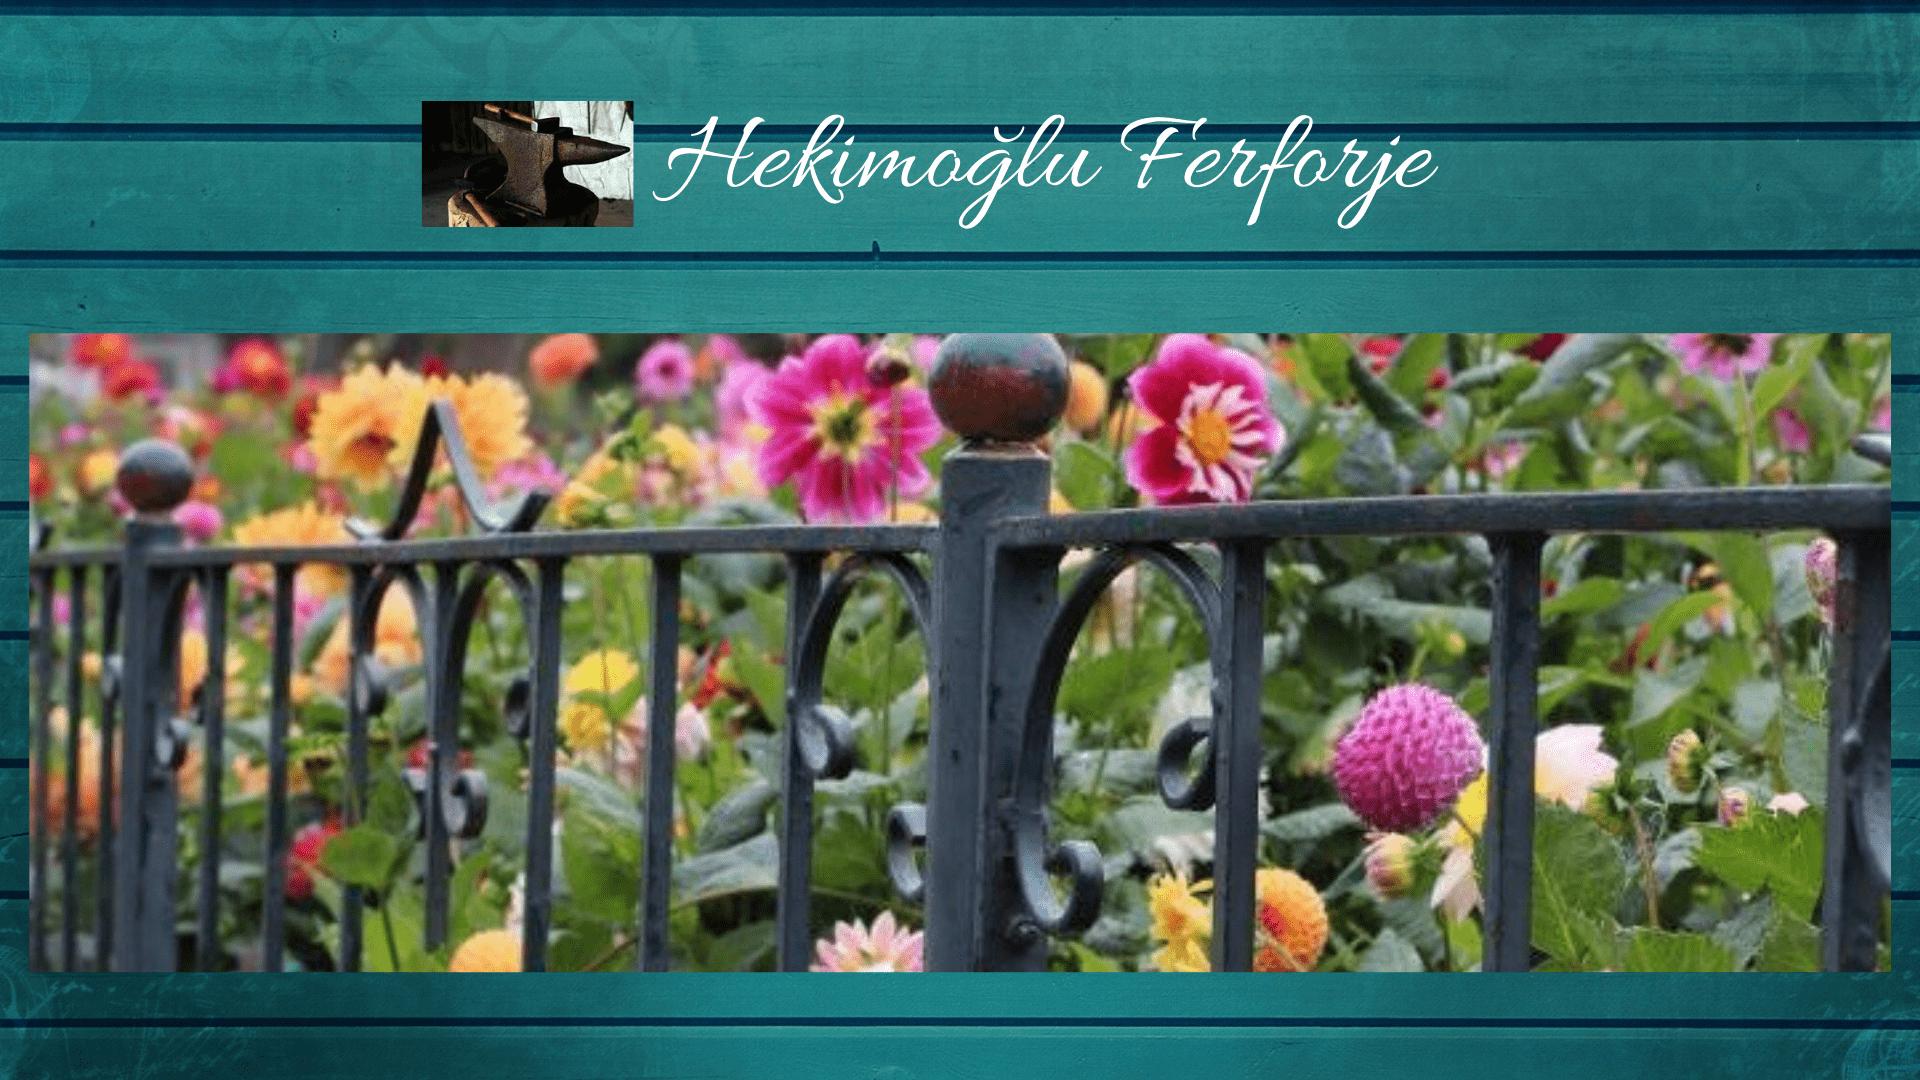 Ferforje bahçe korkuluğu İzmir